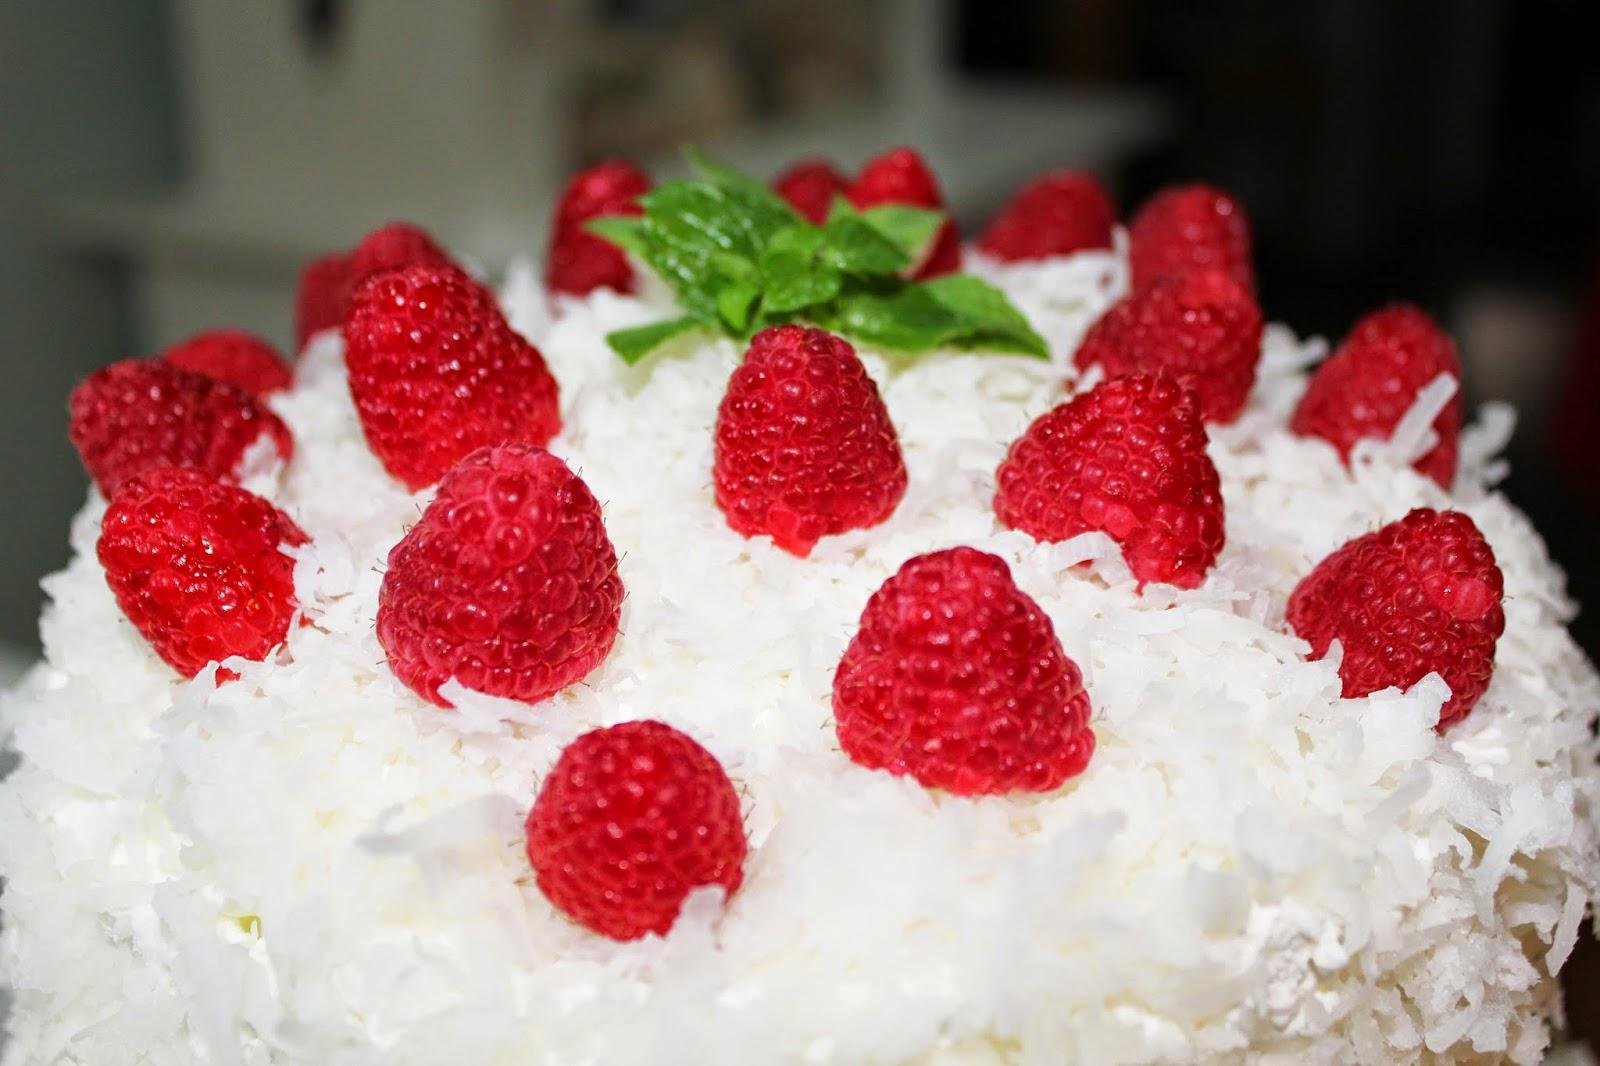 http://savvyentertaining.com/2012/12/21/coconut-cake/